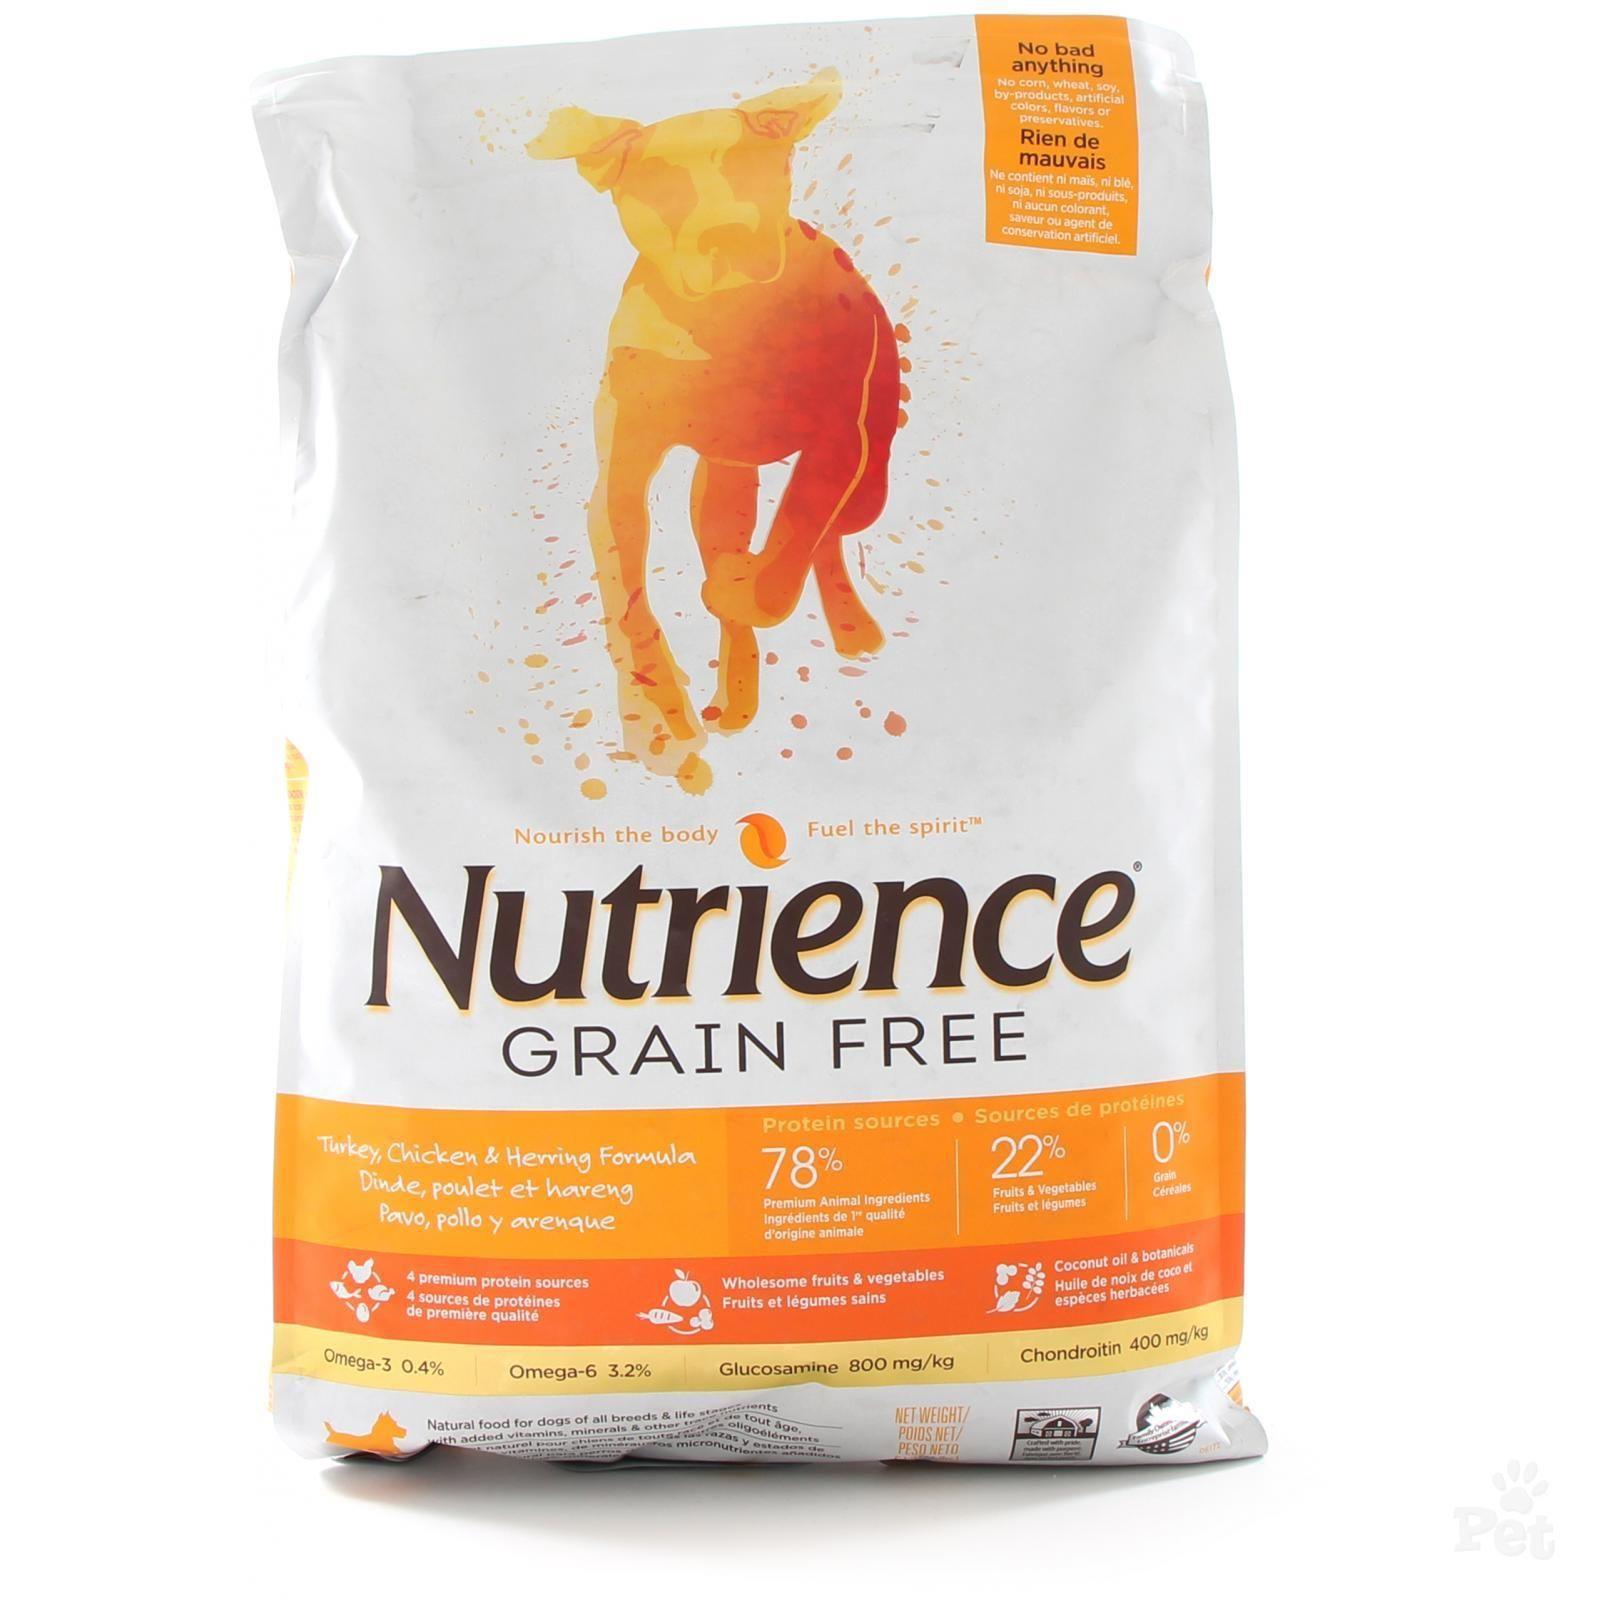 Nutrience Grain Free Chicken Turkey Herring Dog Food Grain